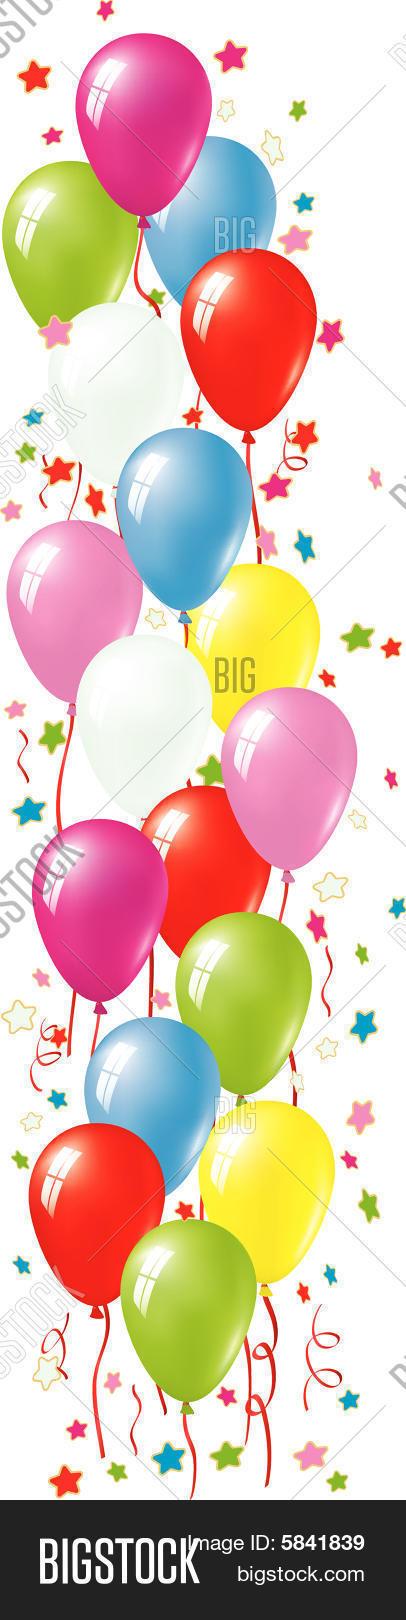 Birthday Balloons Border Clipart Balloon border template free